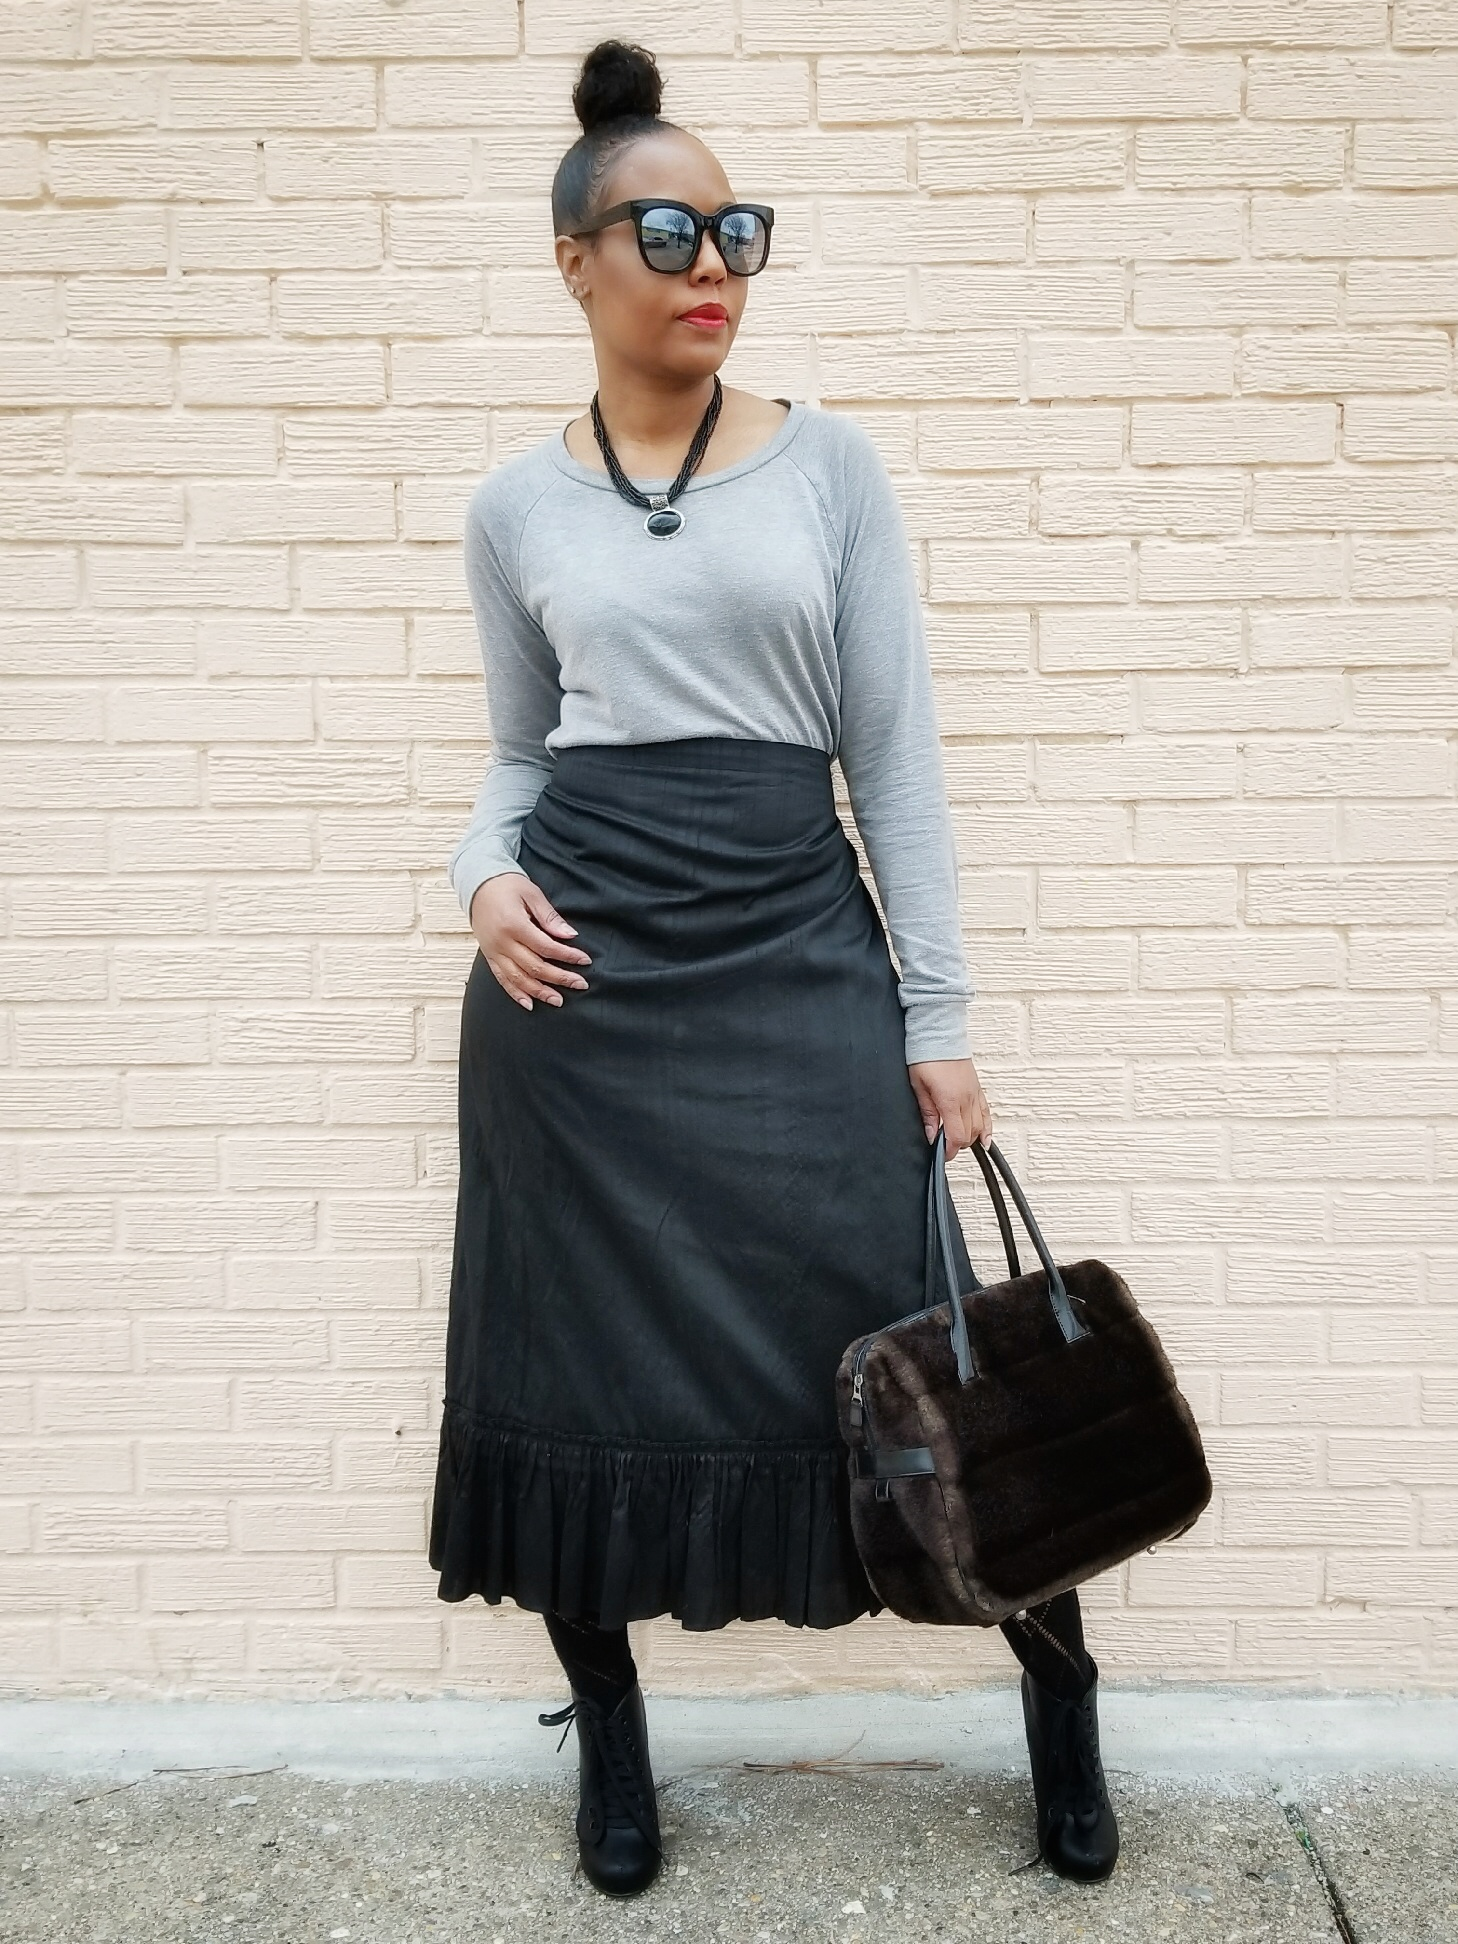 Sweatshirt (Forever21) Alternatives  here  | Skirt (old) | Booties (old)